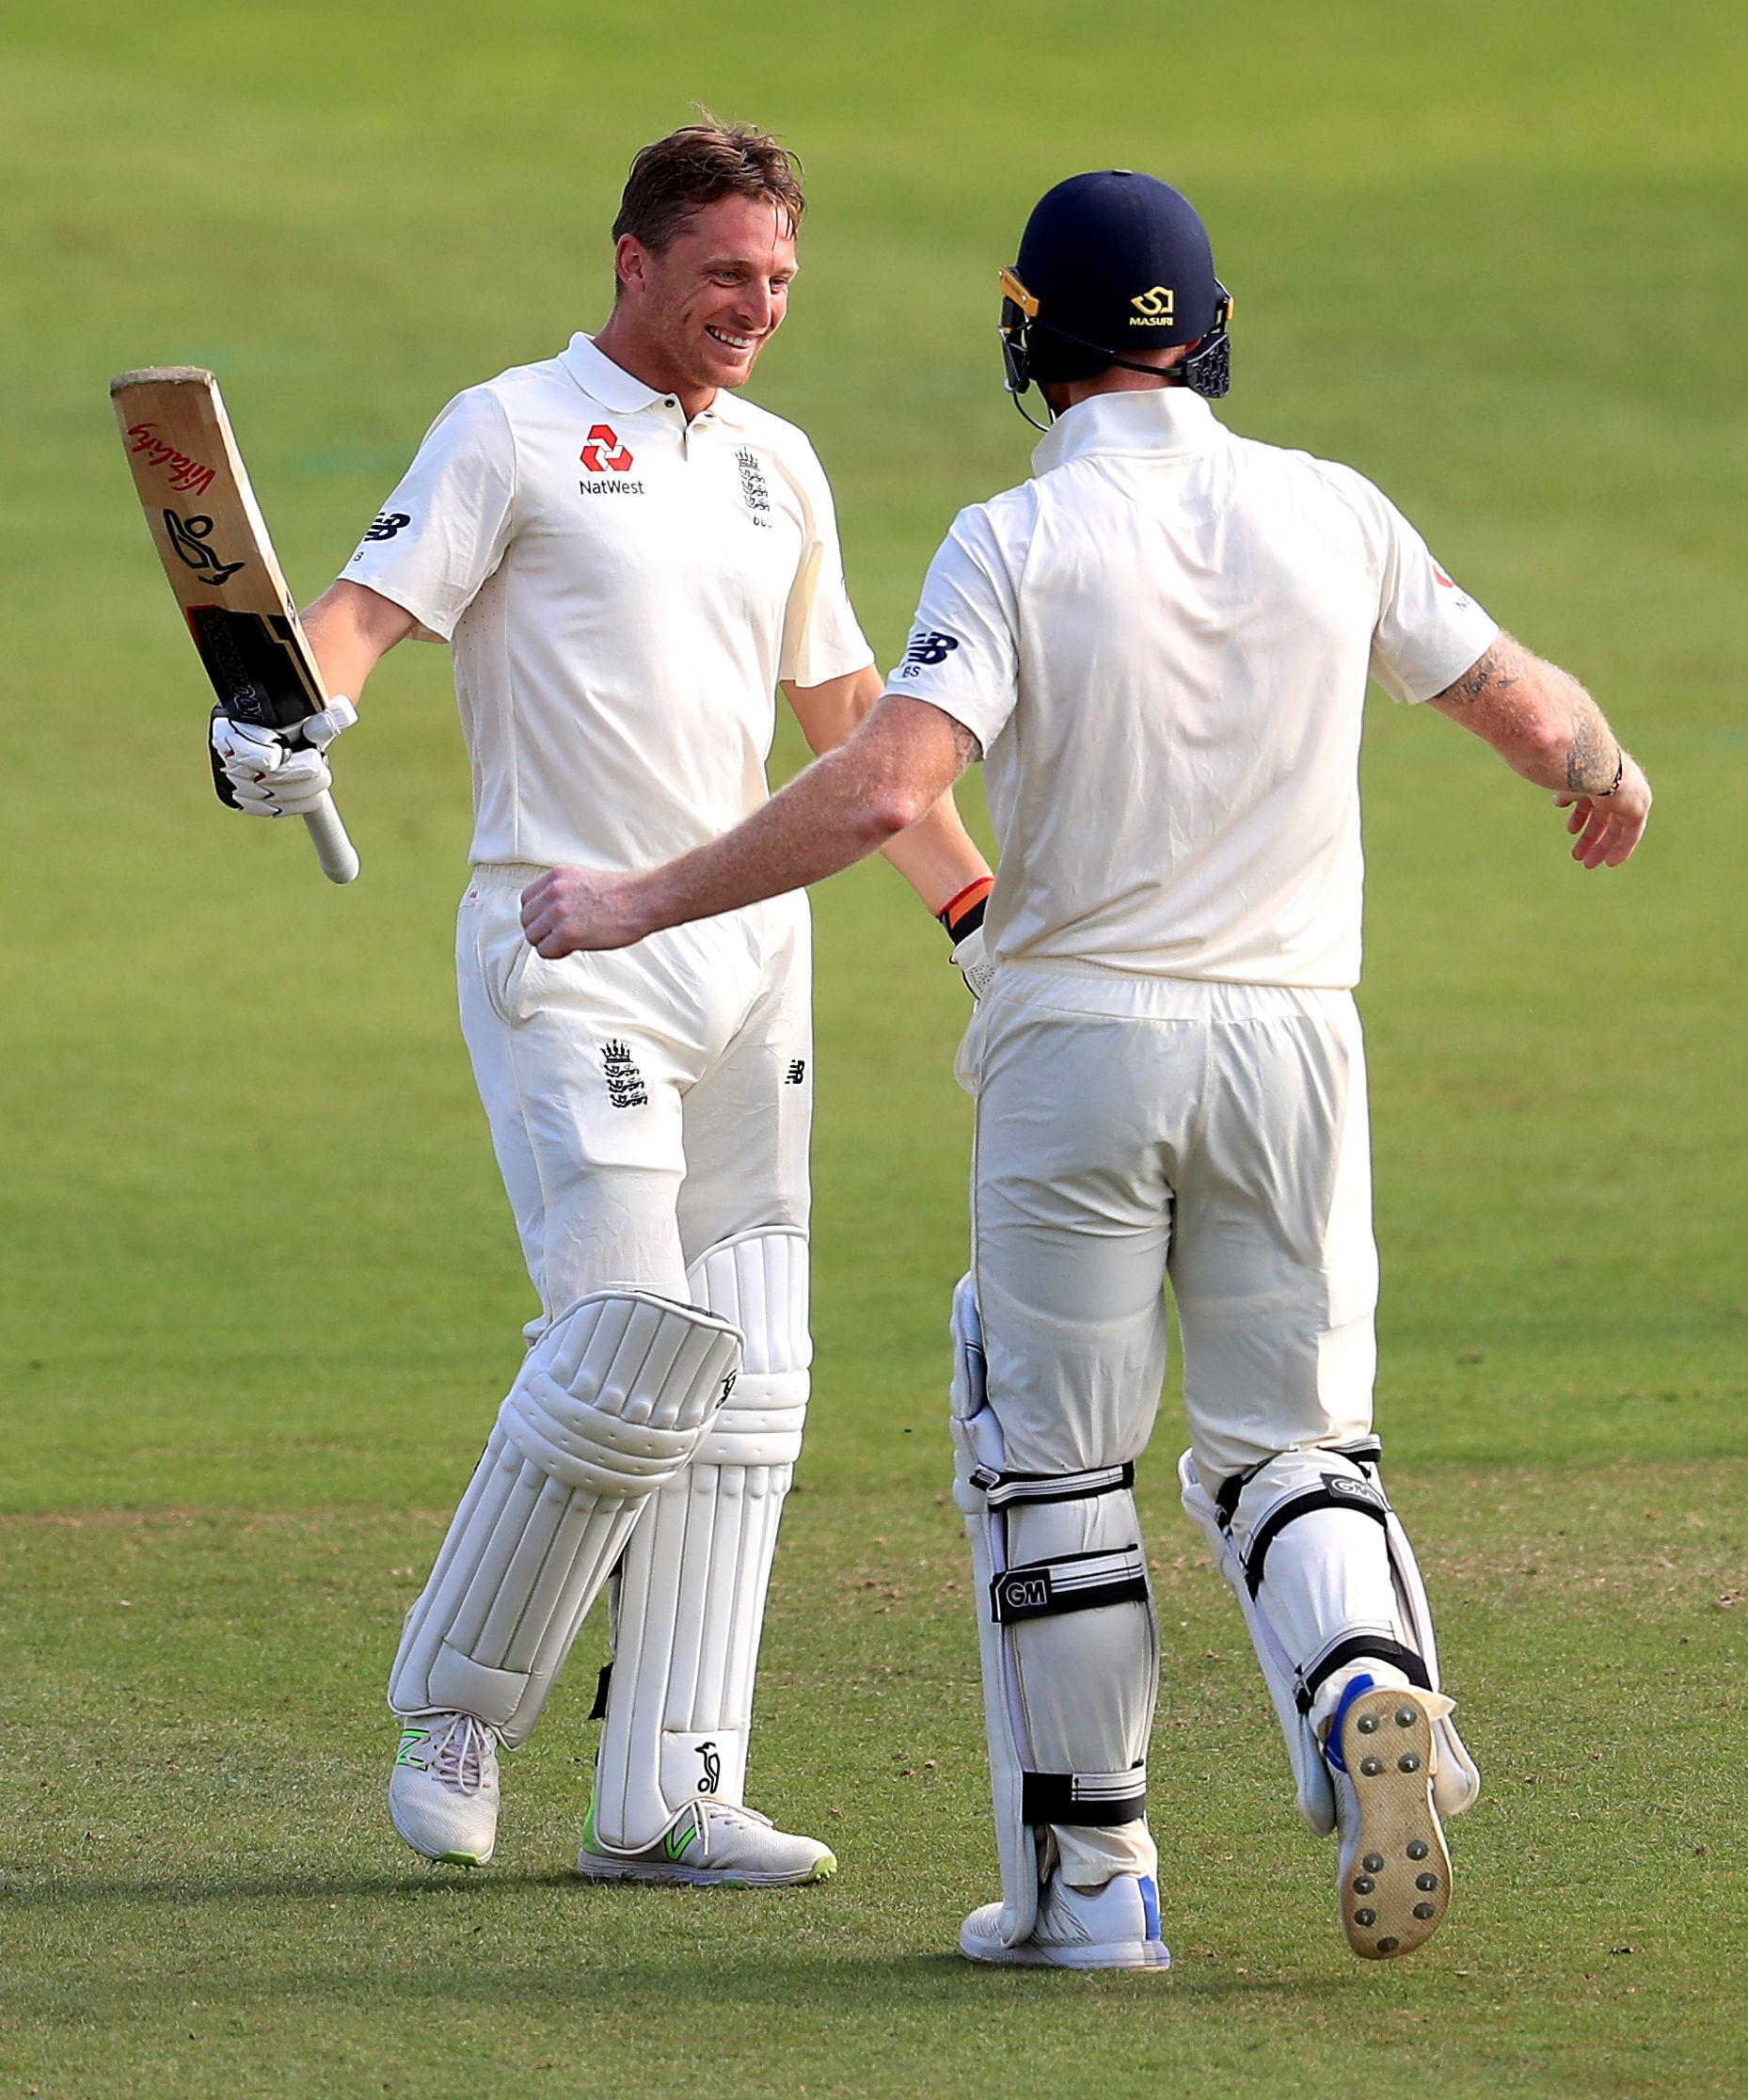 Ben Stokes helped Jos Buttler reach a maiden Test century